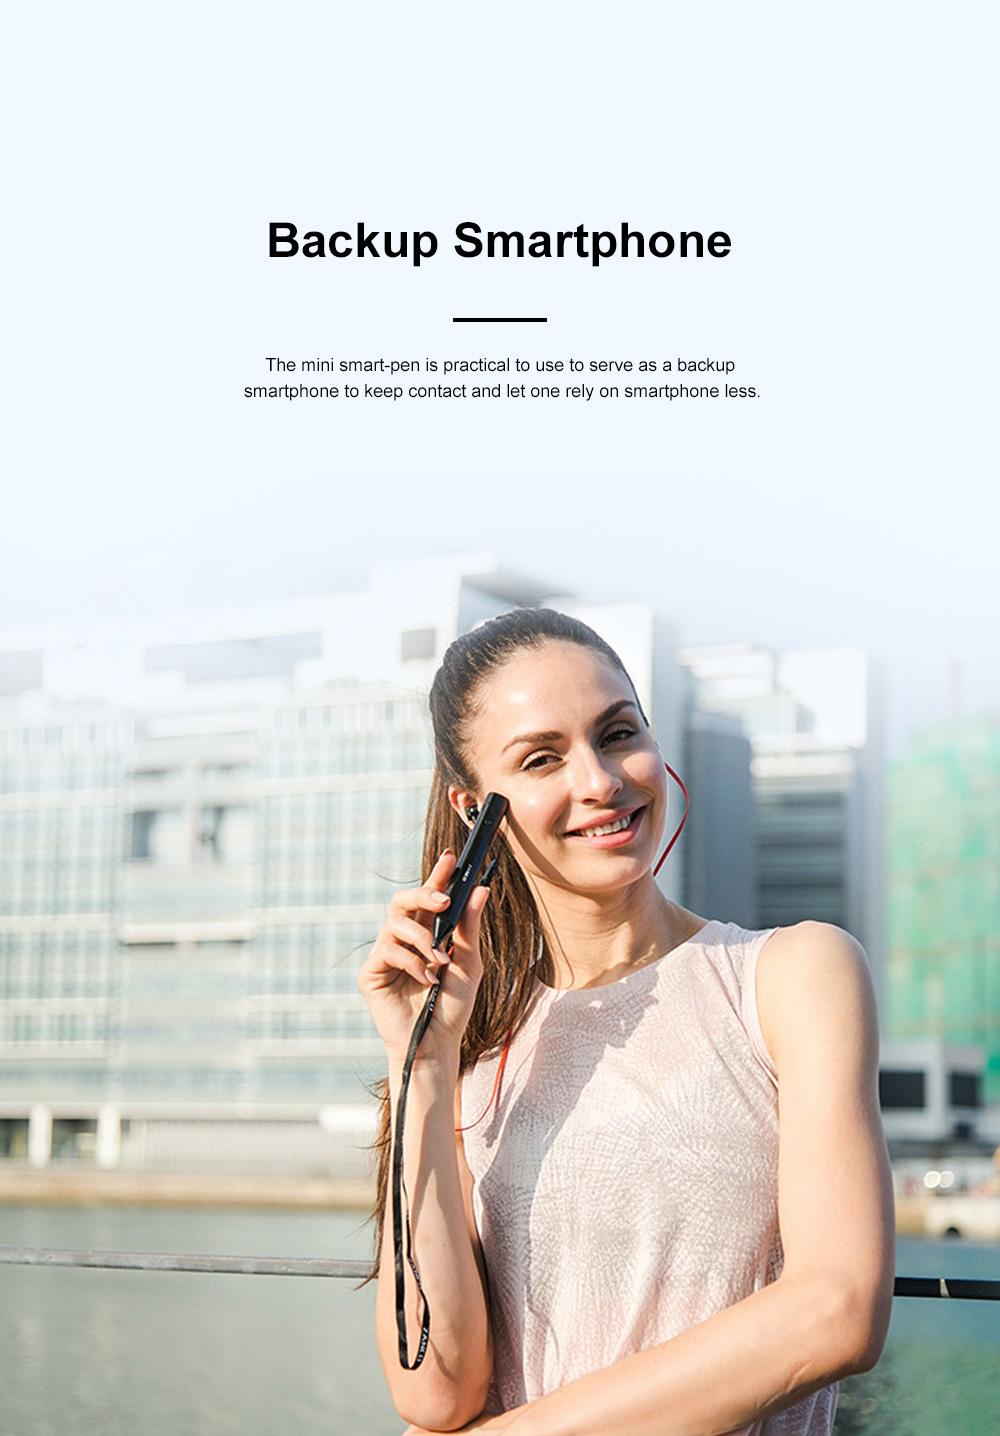 Mini Recording Smart-pen for Multifunctional Portable Exquisite Pen-like Smartphone Laser Pointer Digital Voice Recorder Backup Device 6